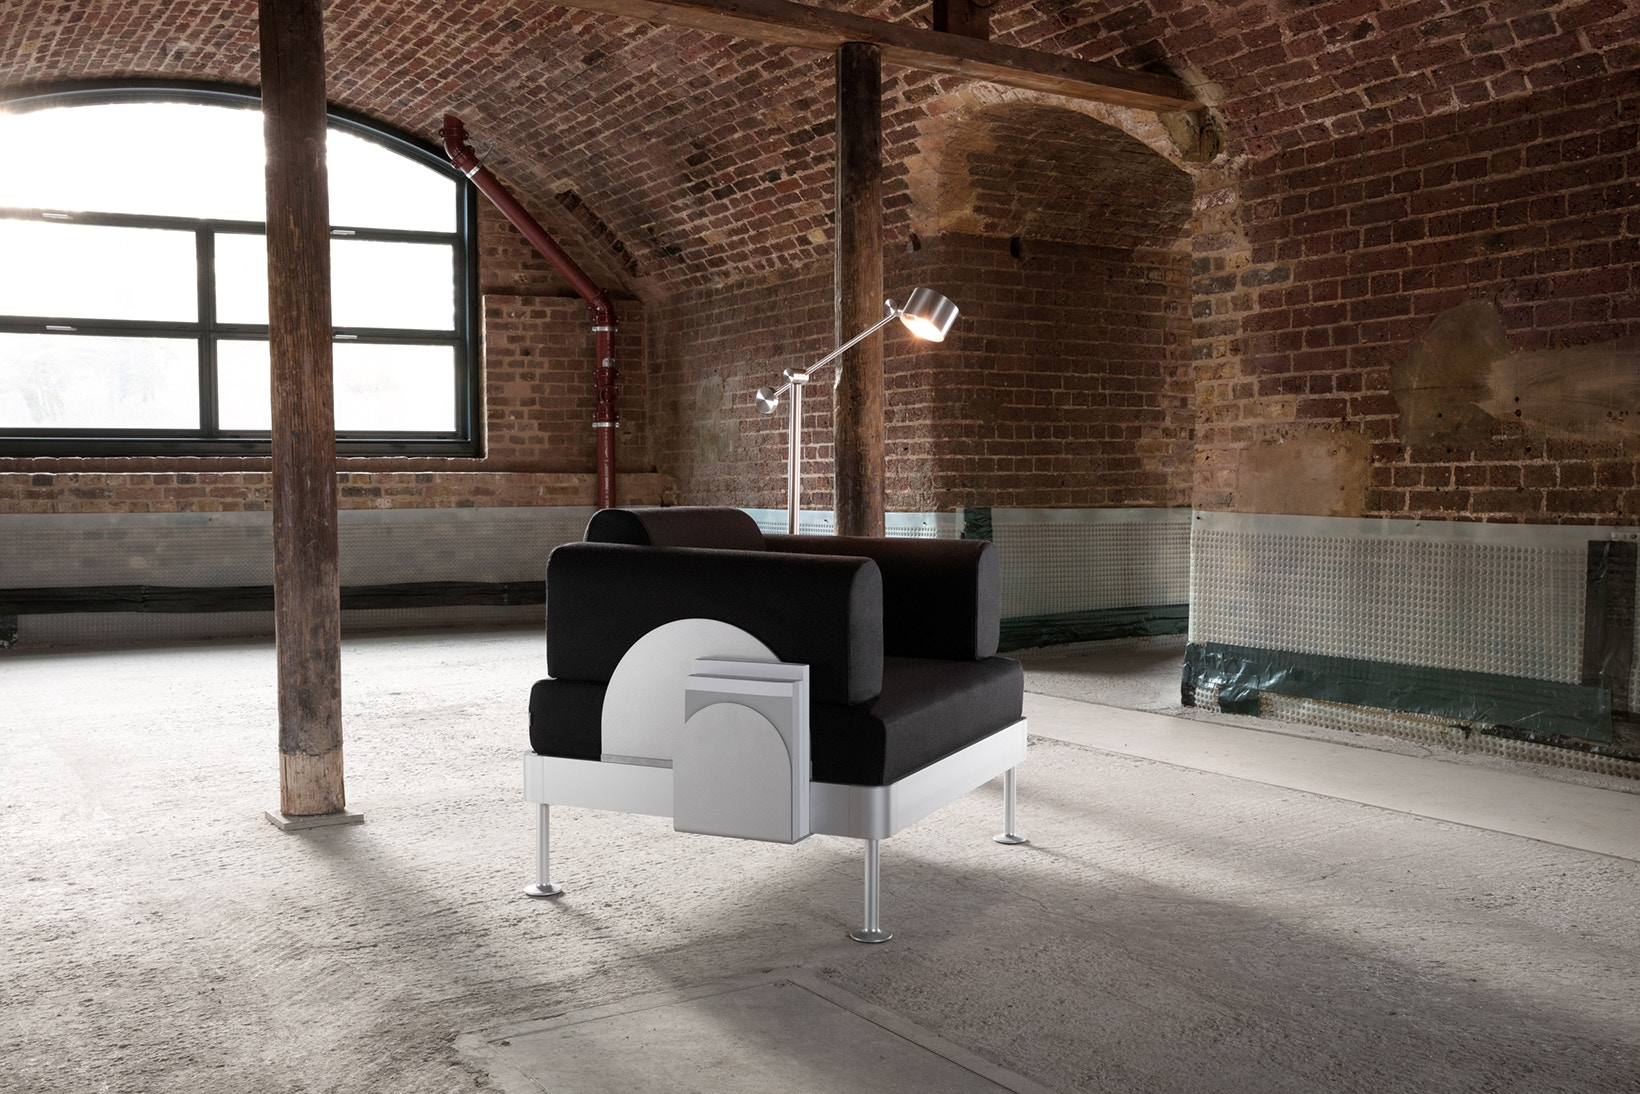 tom dixon zaprojektowa kolekcj modu owych mebli dla ikea. Black Bedroom Furniture Sets. Home Design Ideas